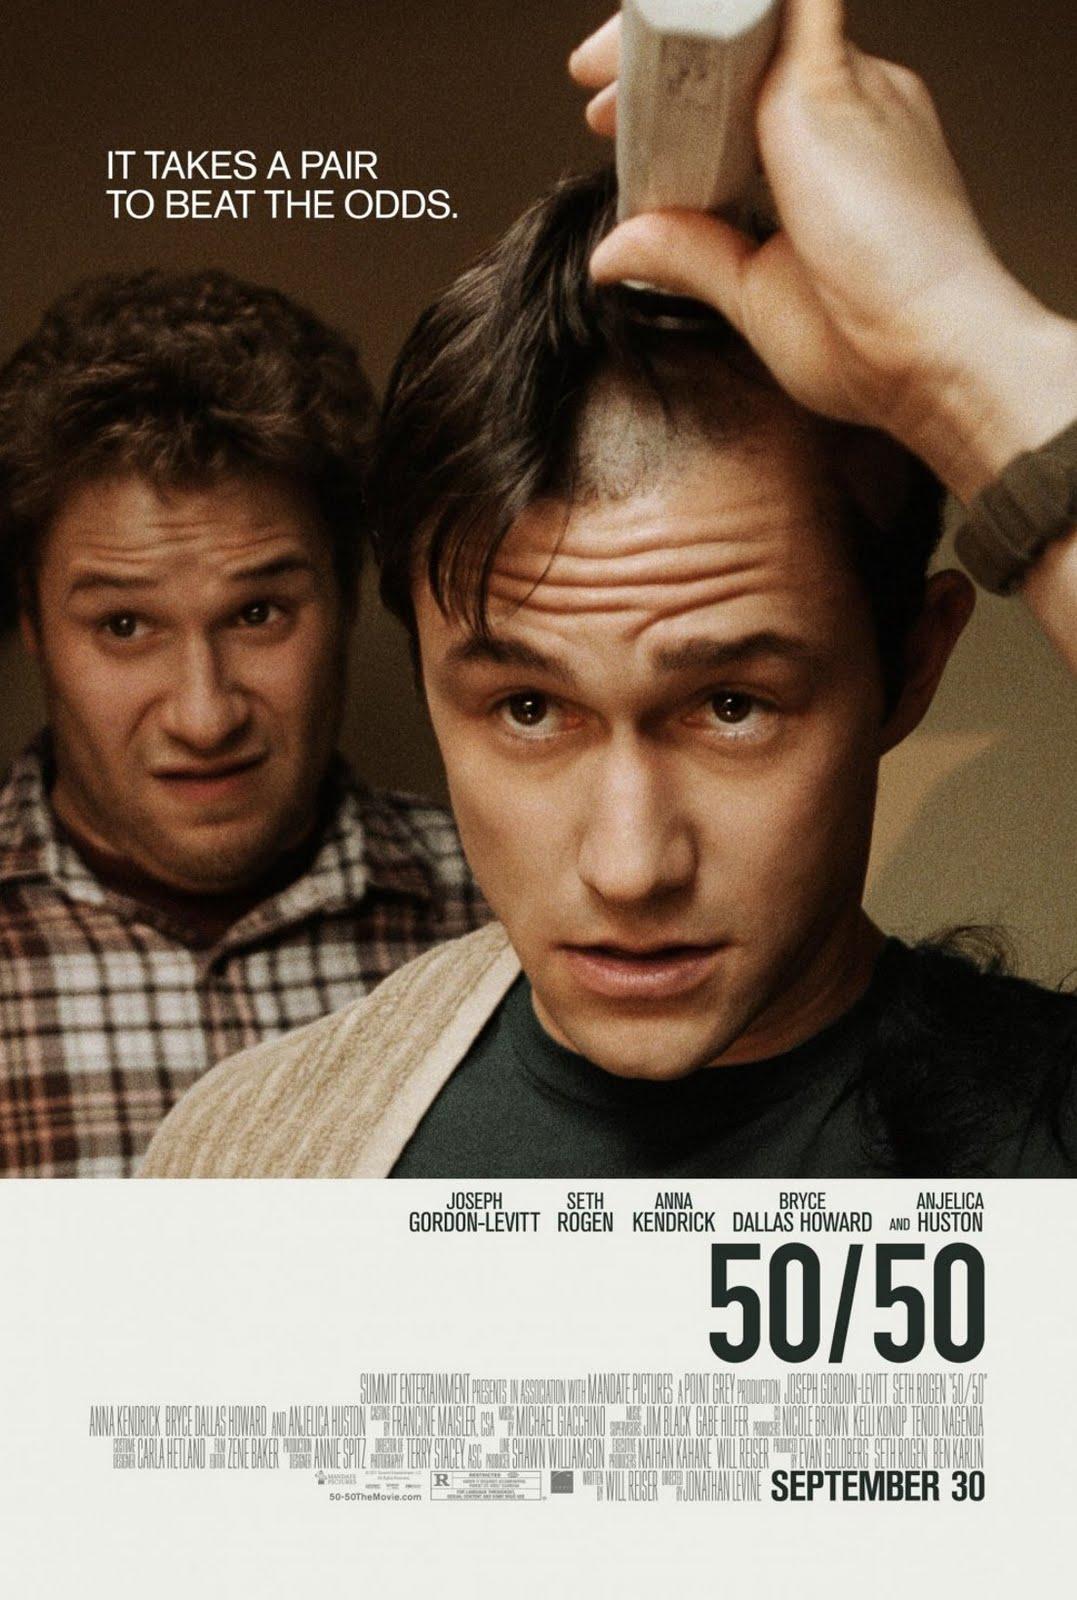 http://4.bp.blogspot.com/-O7sobI_iGns/TtepdN7WayI/AAAAAAAAYnE/pyx16YsTtxA/s1600/50-50-movie-poster.jpg